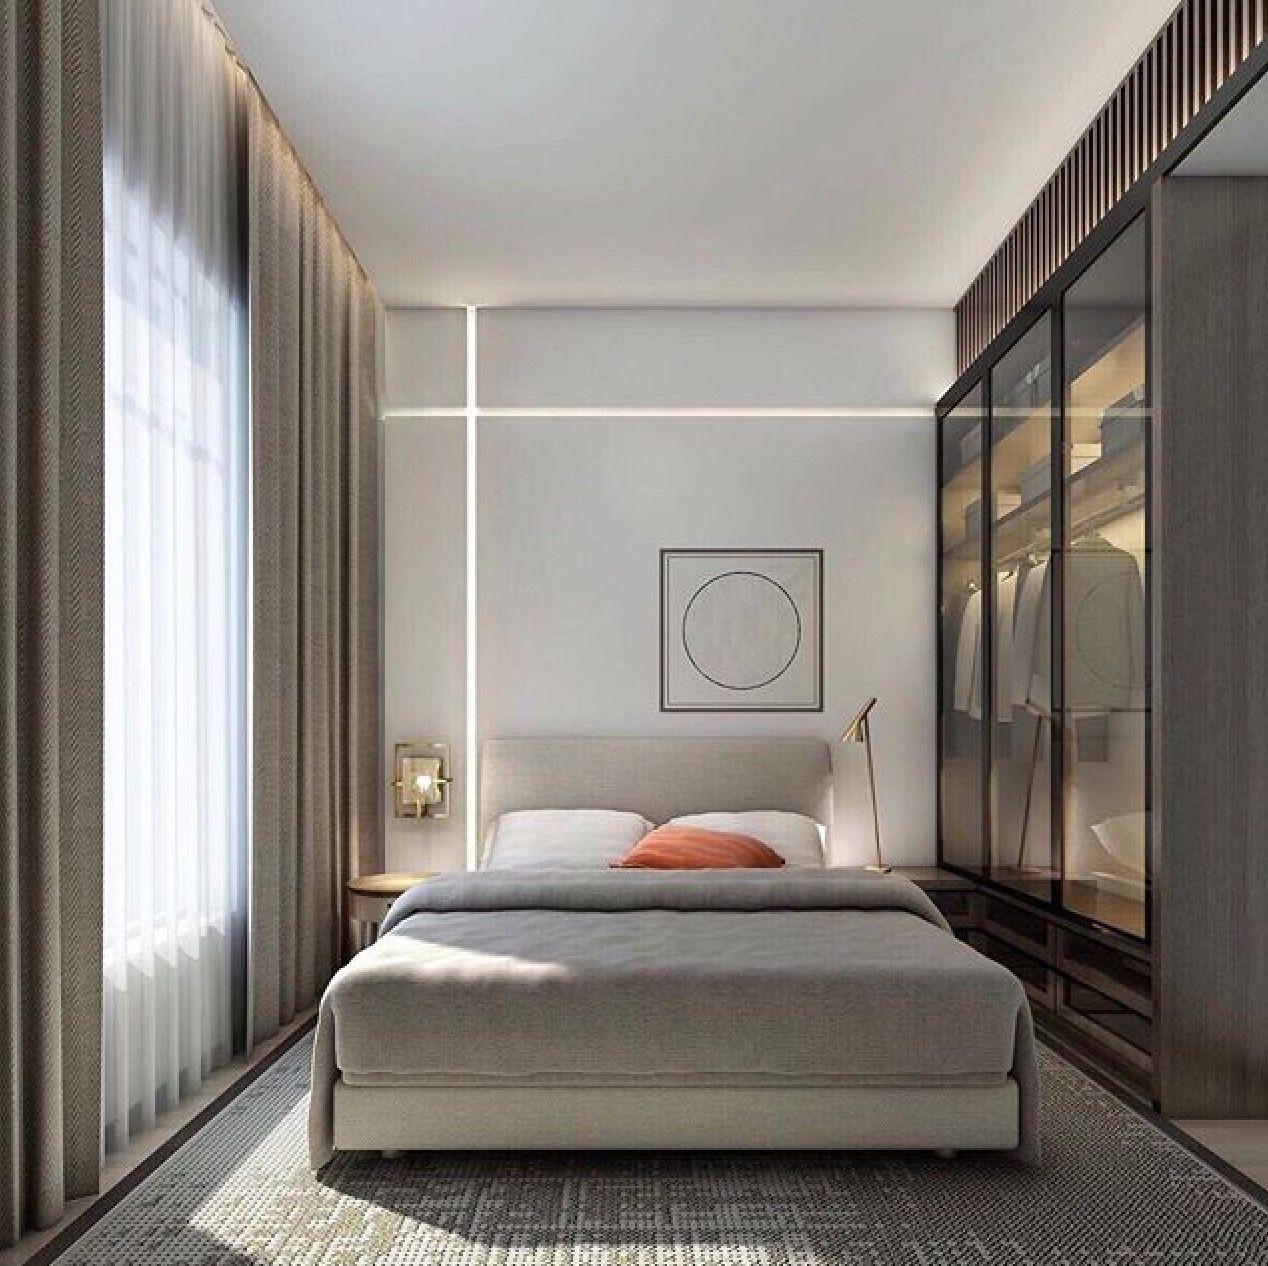 Bedroom Apartment Bedroom Decor Small Master Bedroom Modern